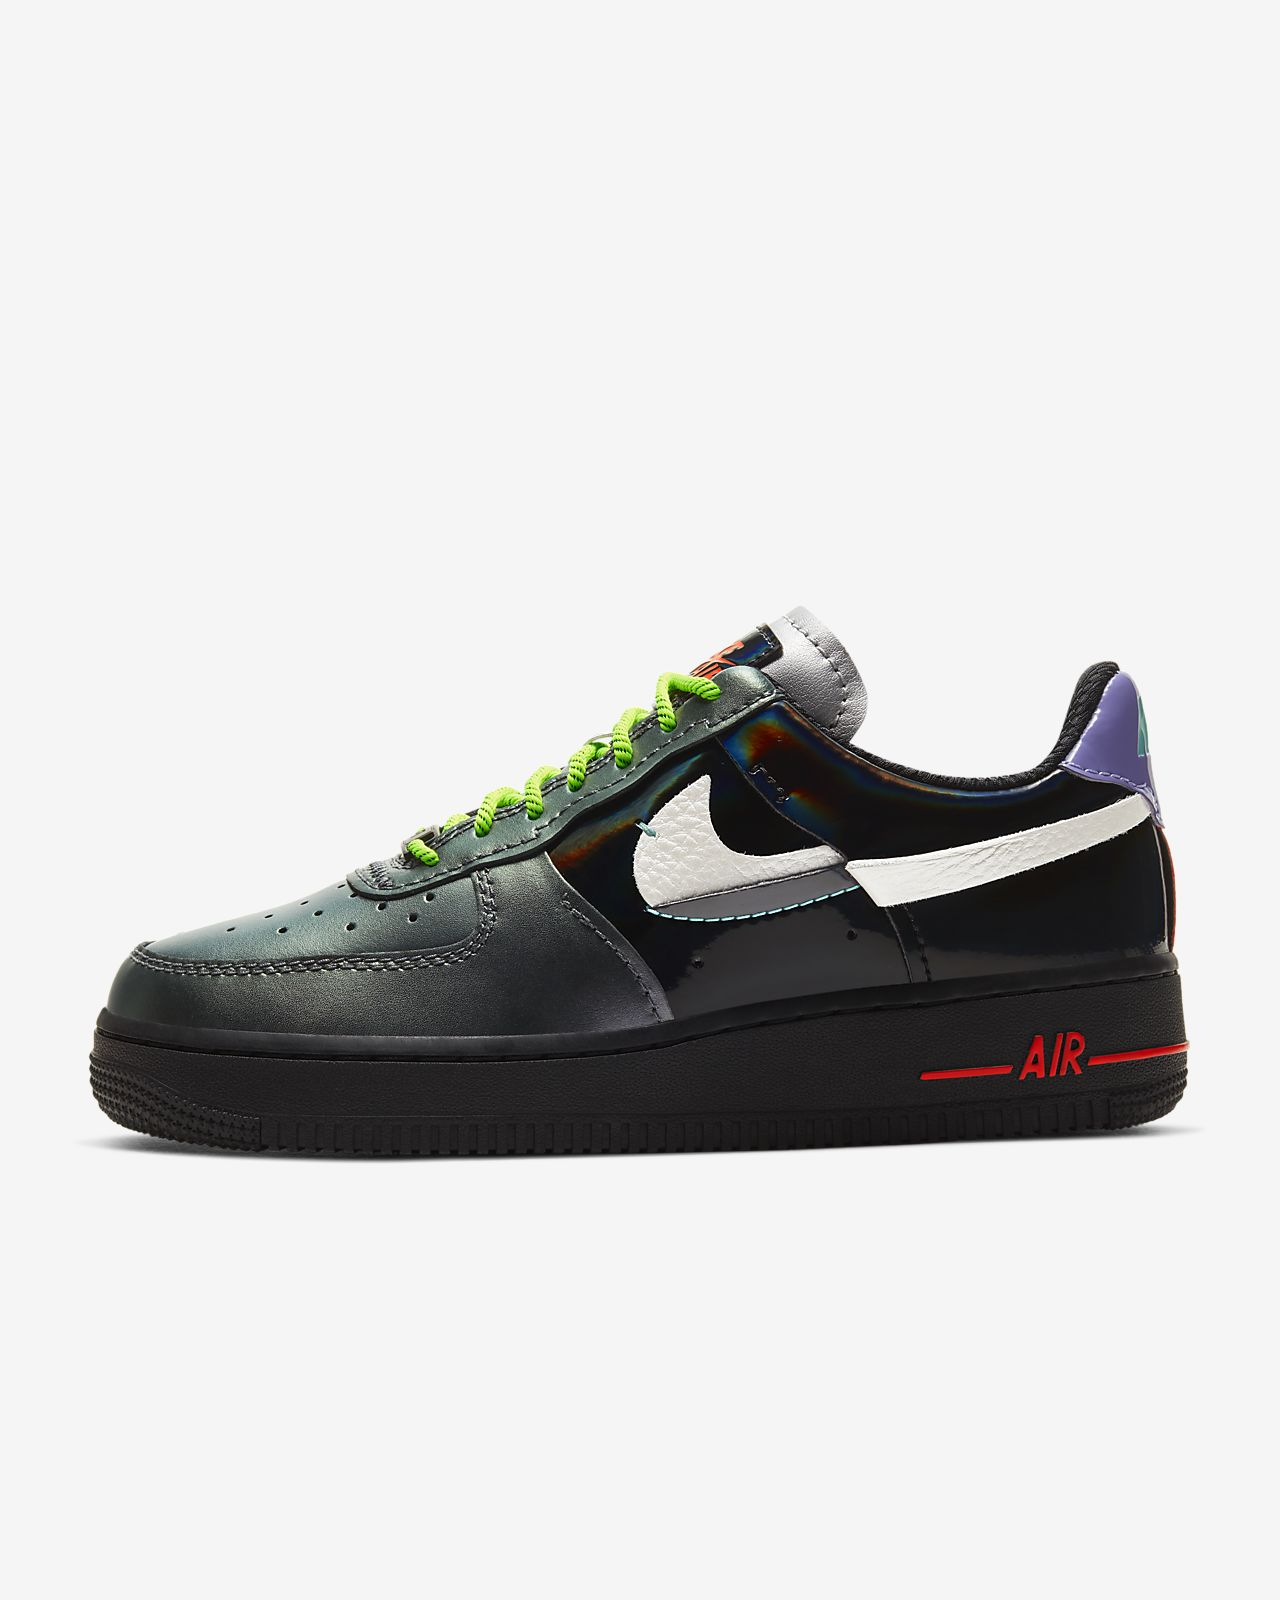 Calzado para mujer Nike Air Force 1 '07 LX